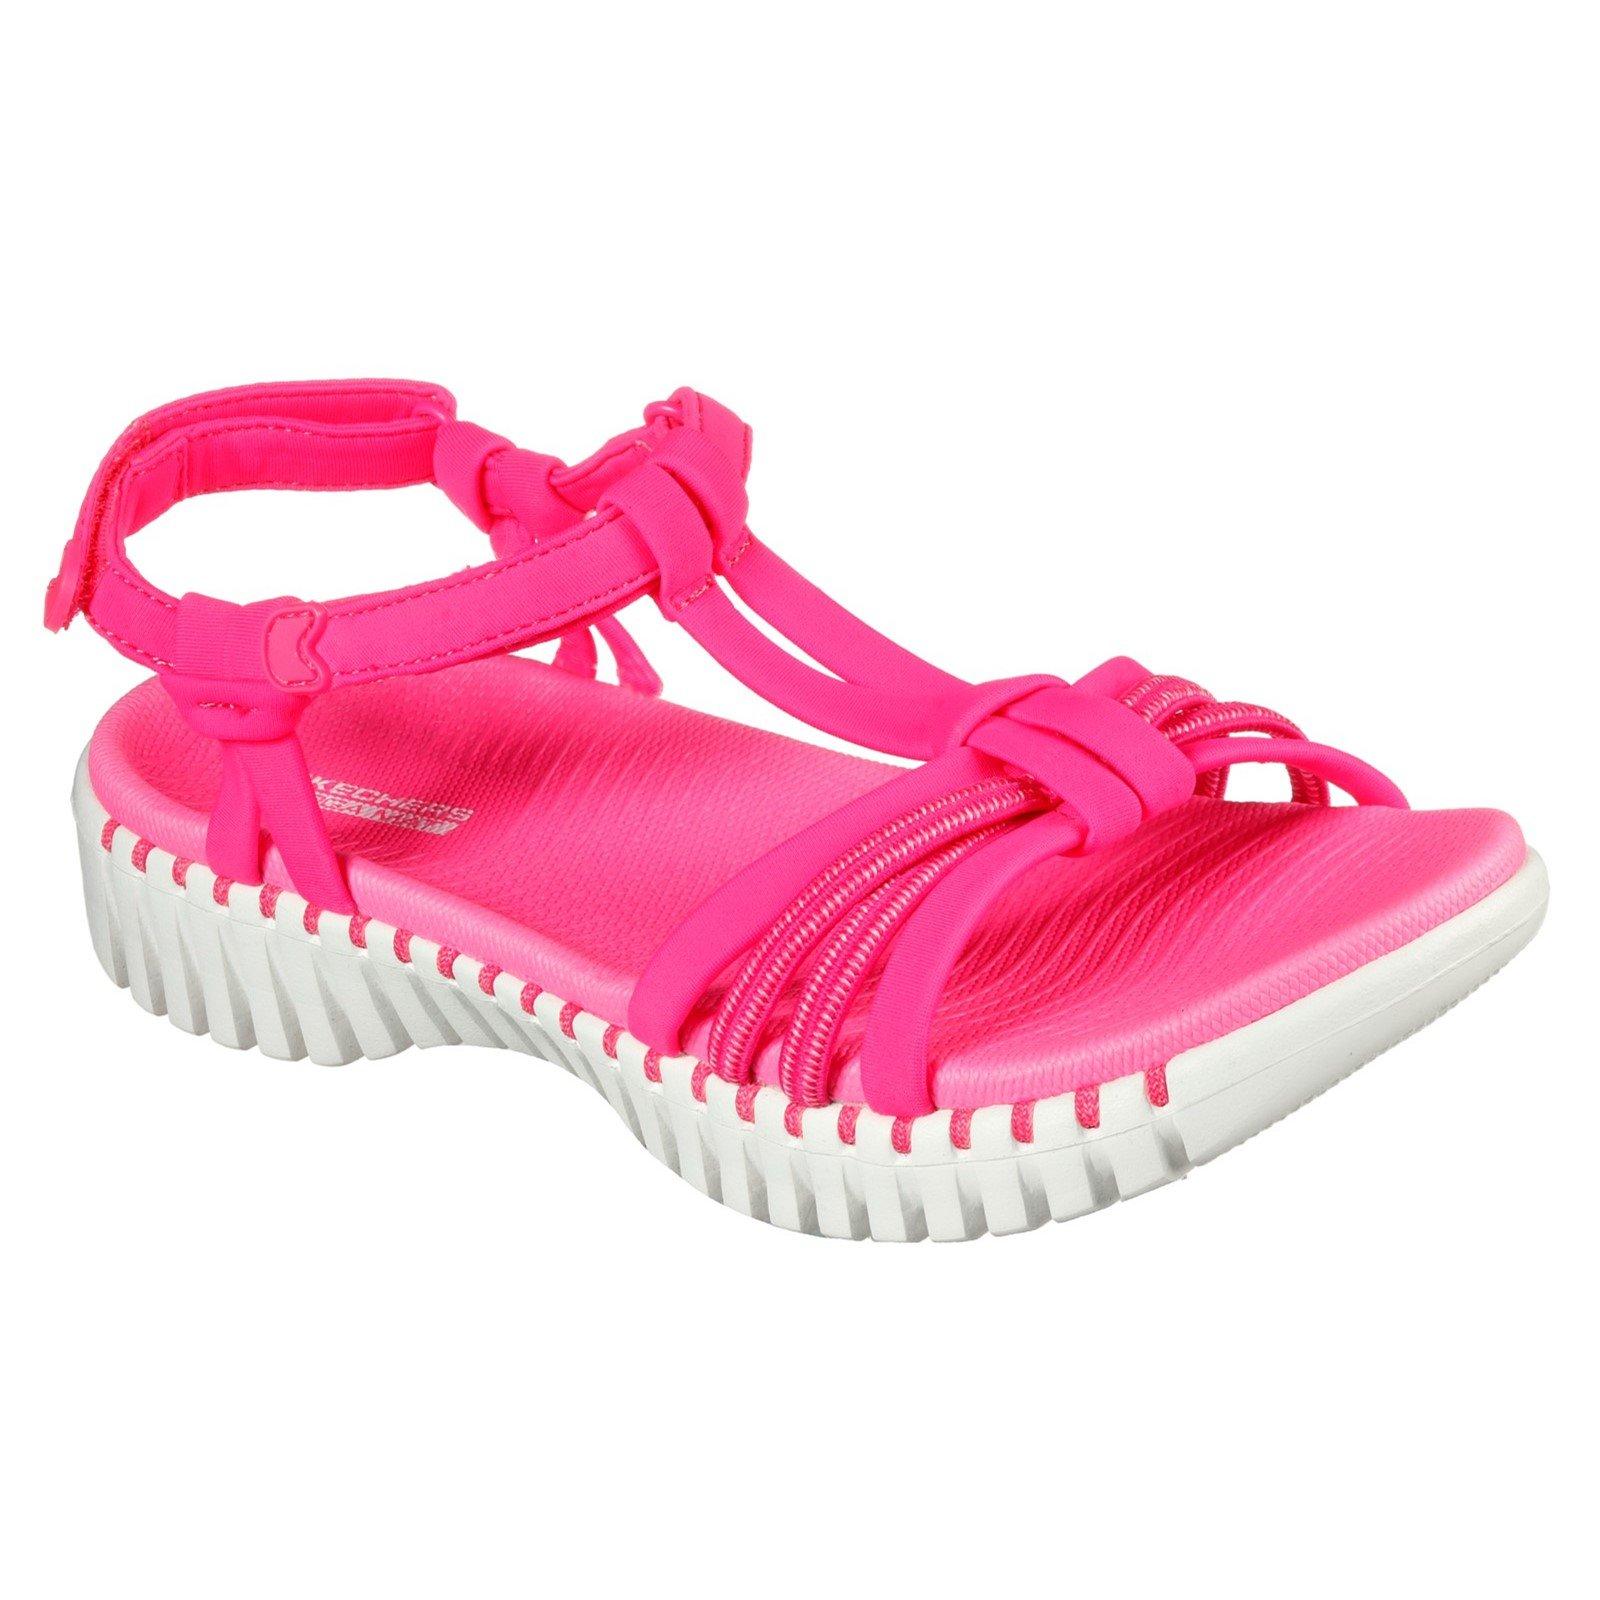 Skechers Women's Go Walk Smart Summer Sandal Various Colours 32156 - Pink 7